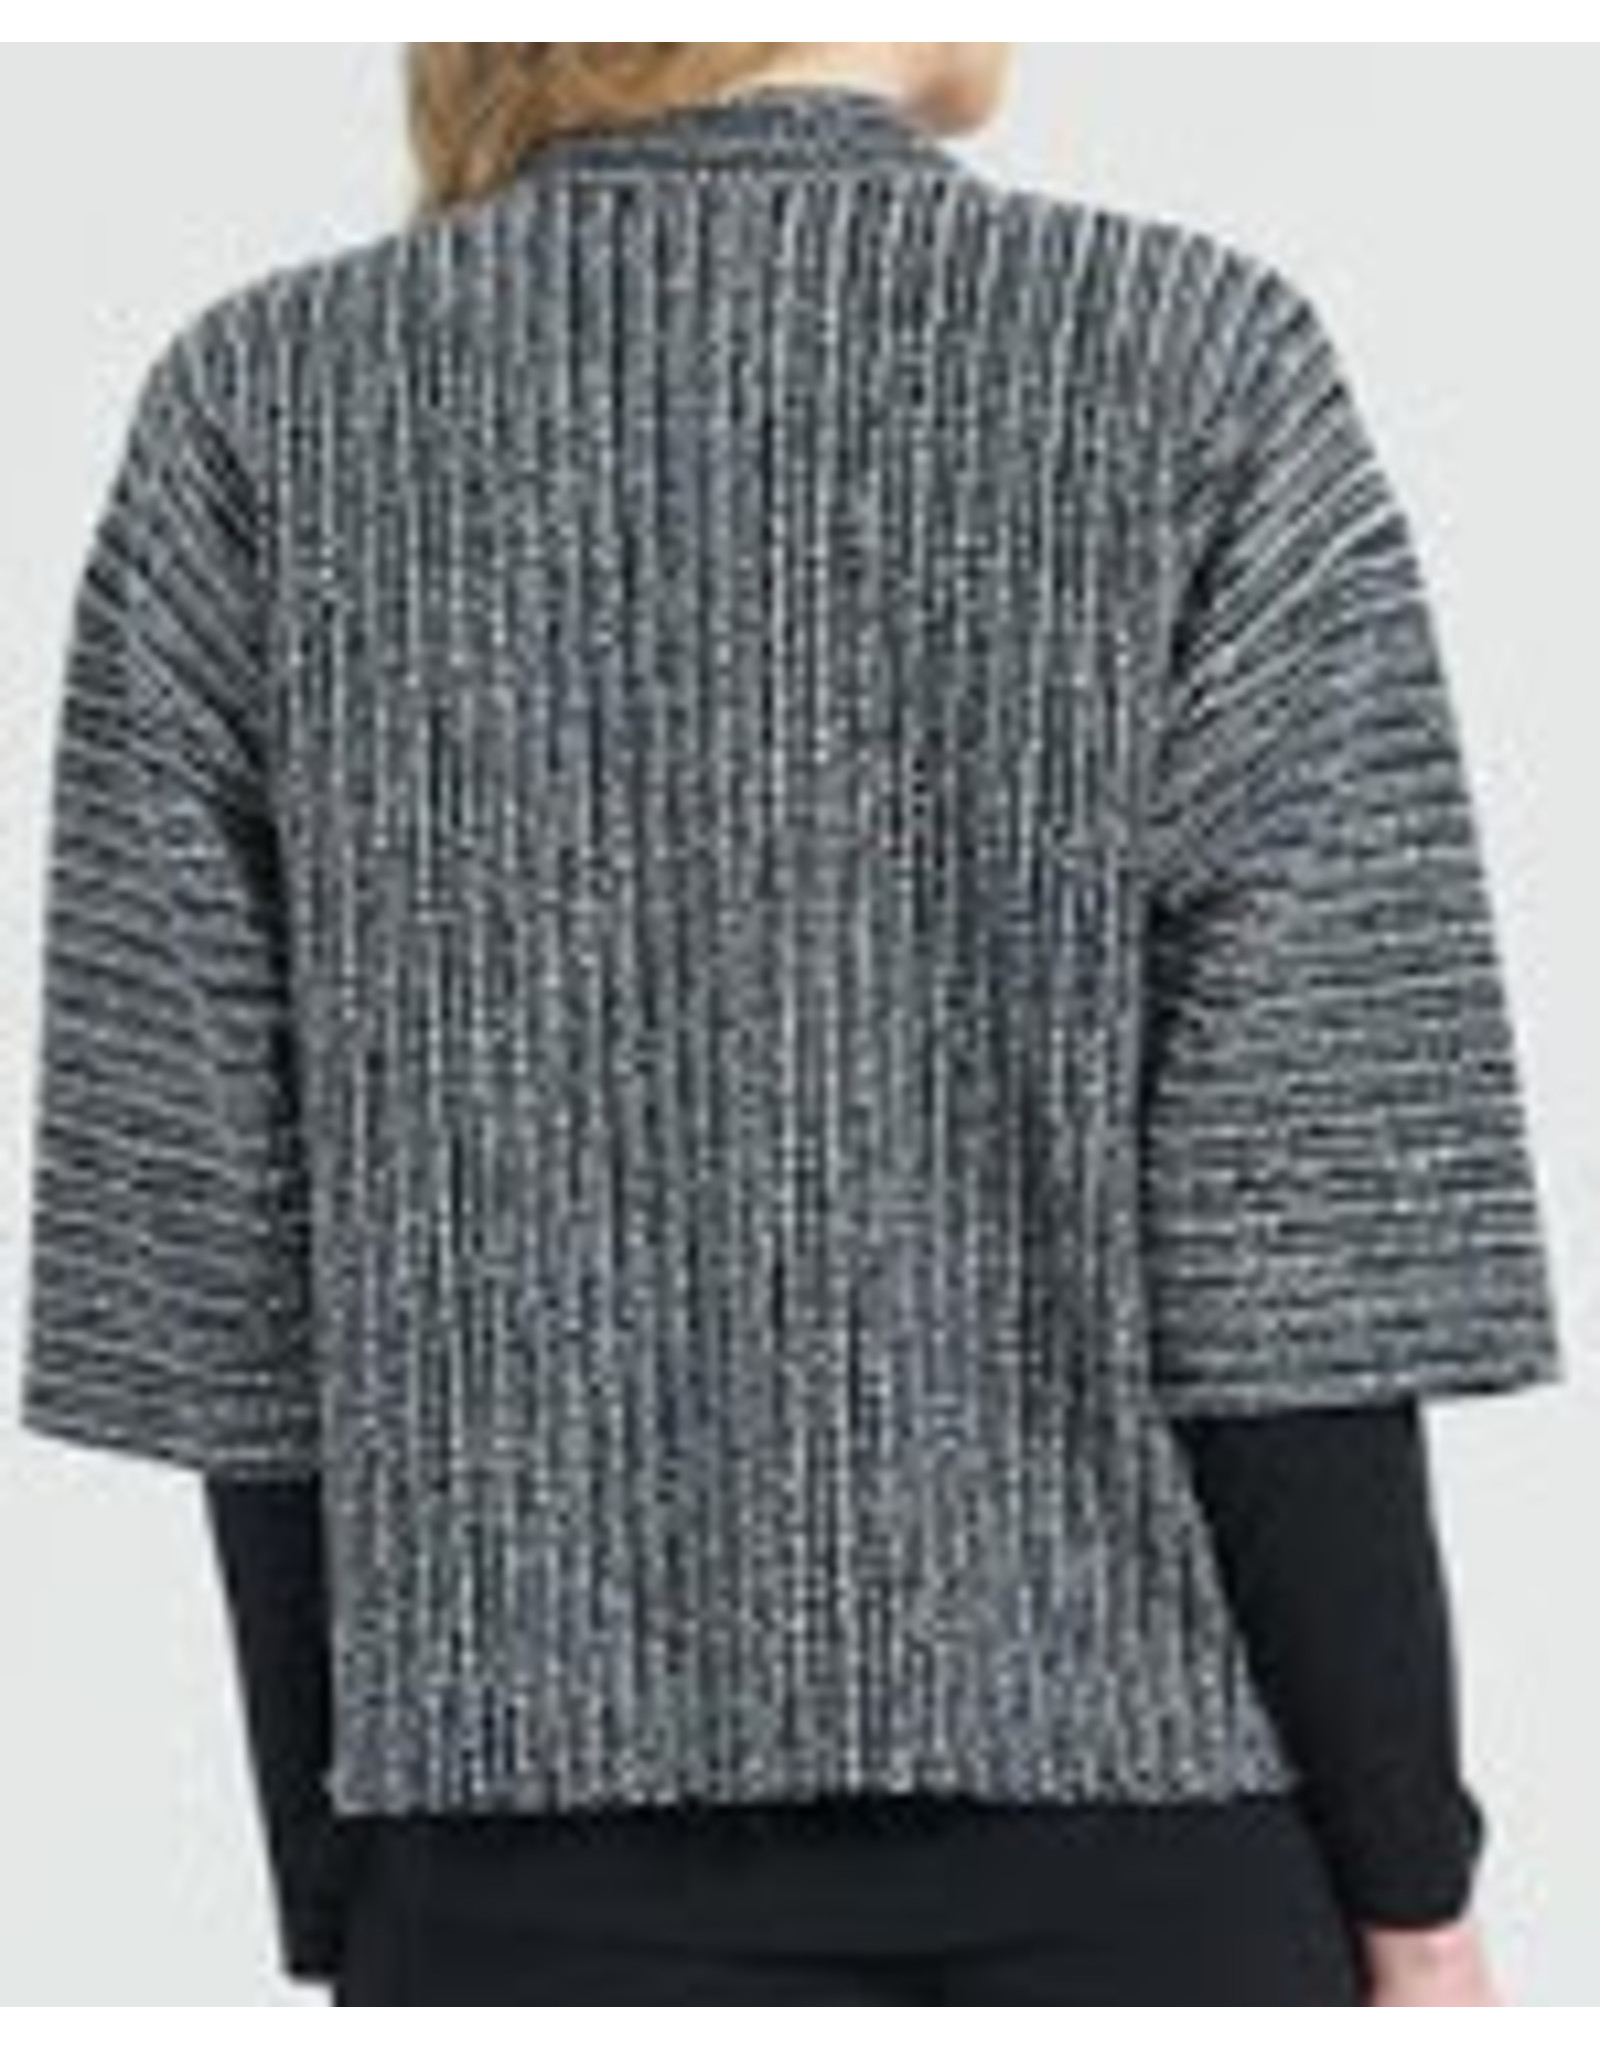 Clara Sunwoo Braid Printed Soft Jacquard Modern Bolero Cardigan